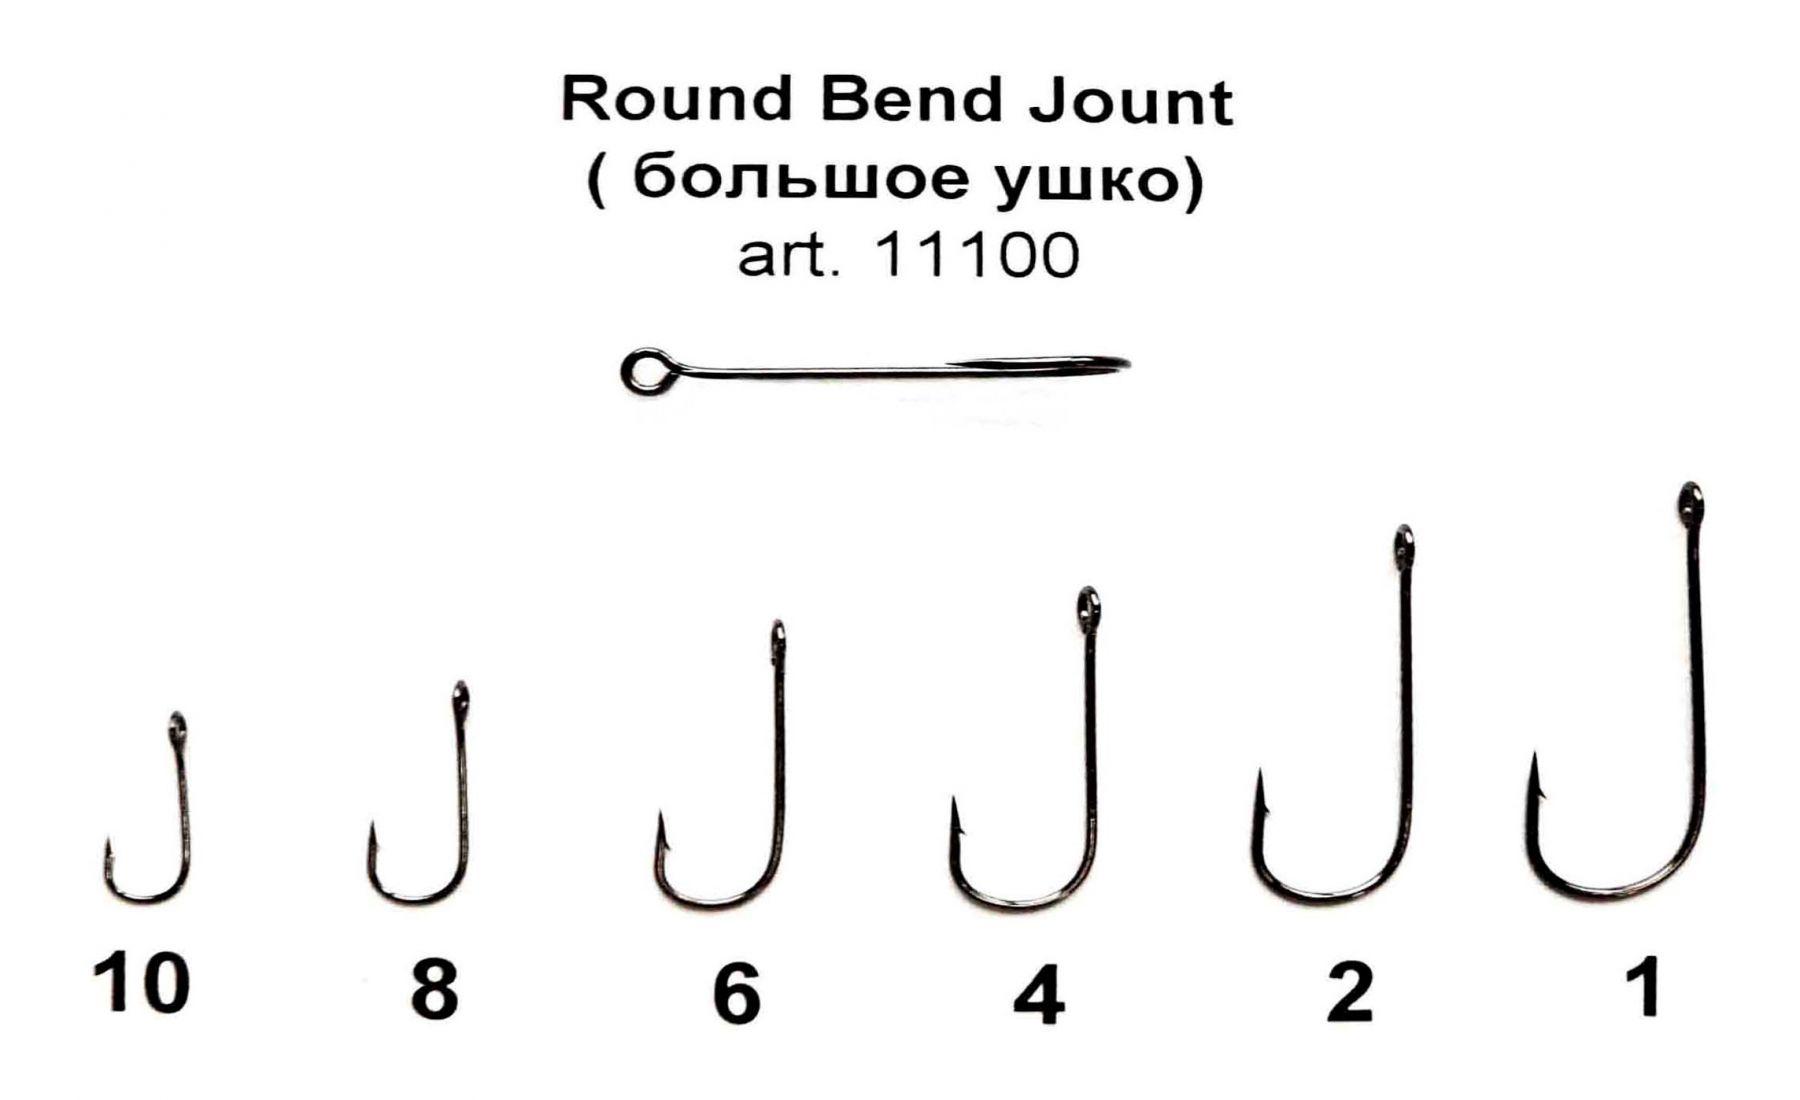 Крючок Fish Season FS Round Bend Jount одинарные с большим ушком  (Артикул:11100) №8